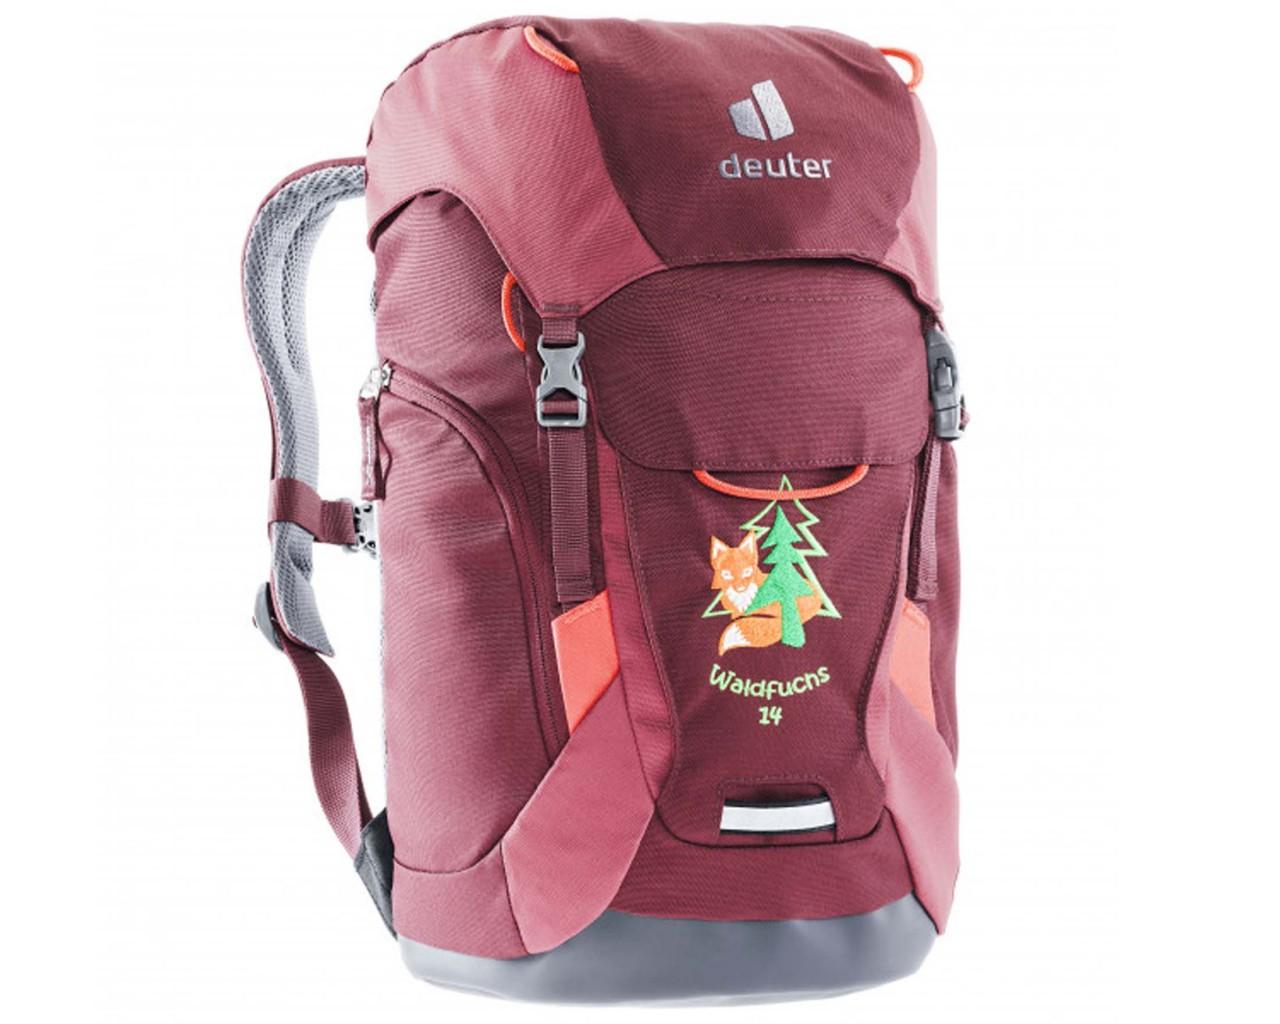 Deuter Waldfuchs 14 litres Kids backpack PFC-free   maron-cardinal